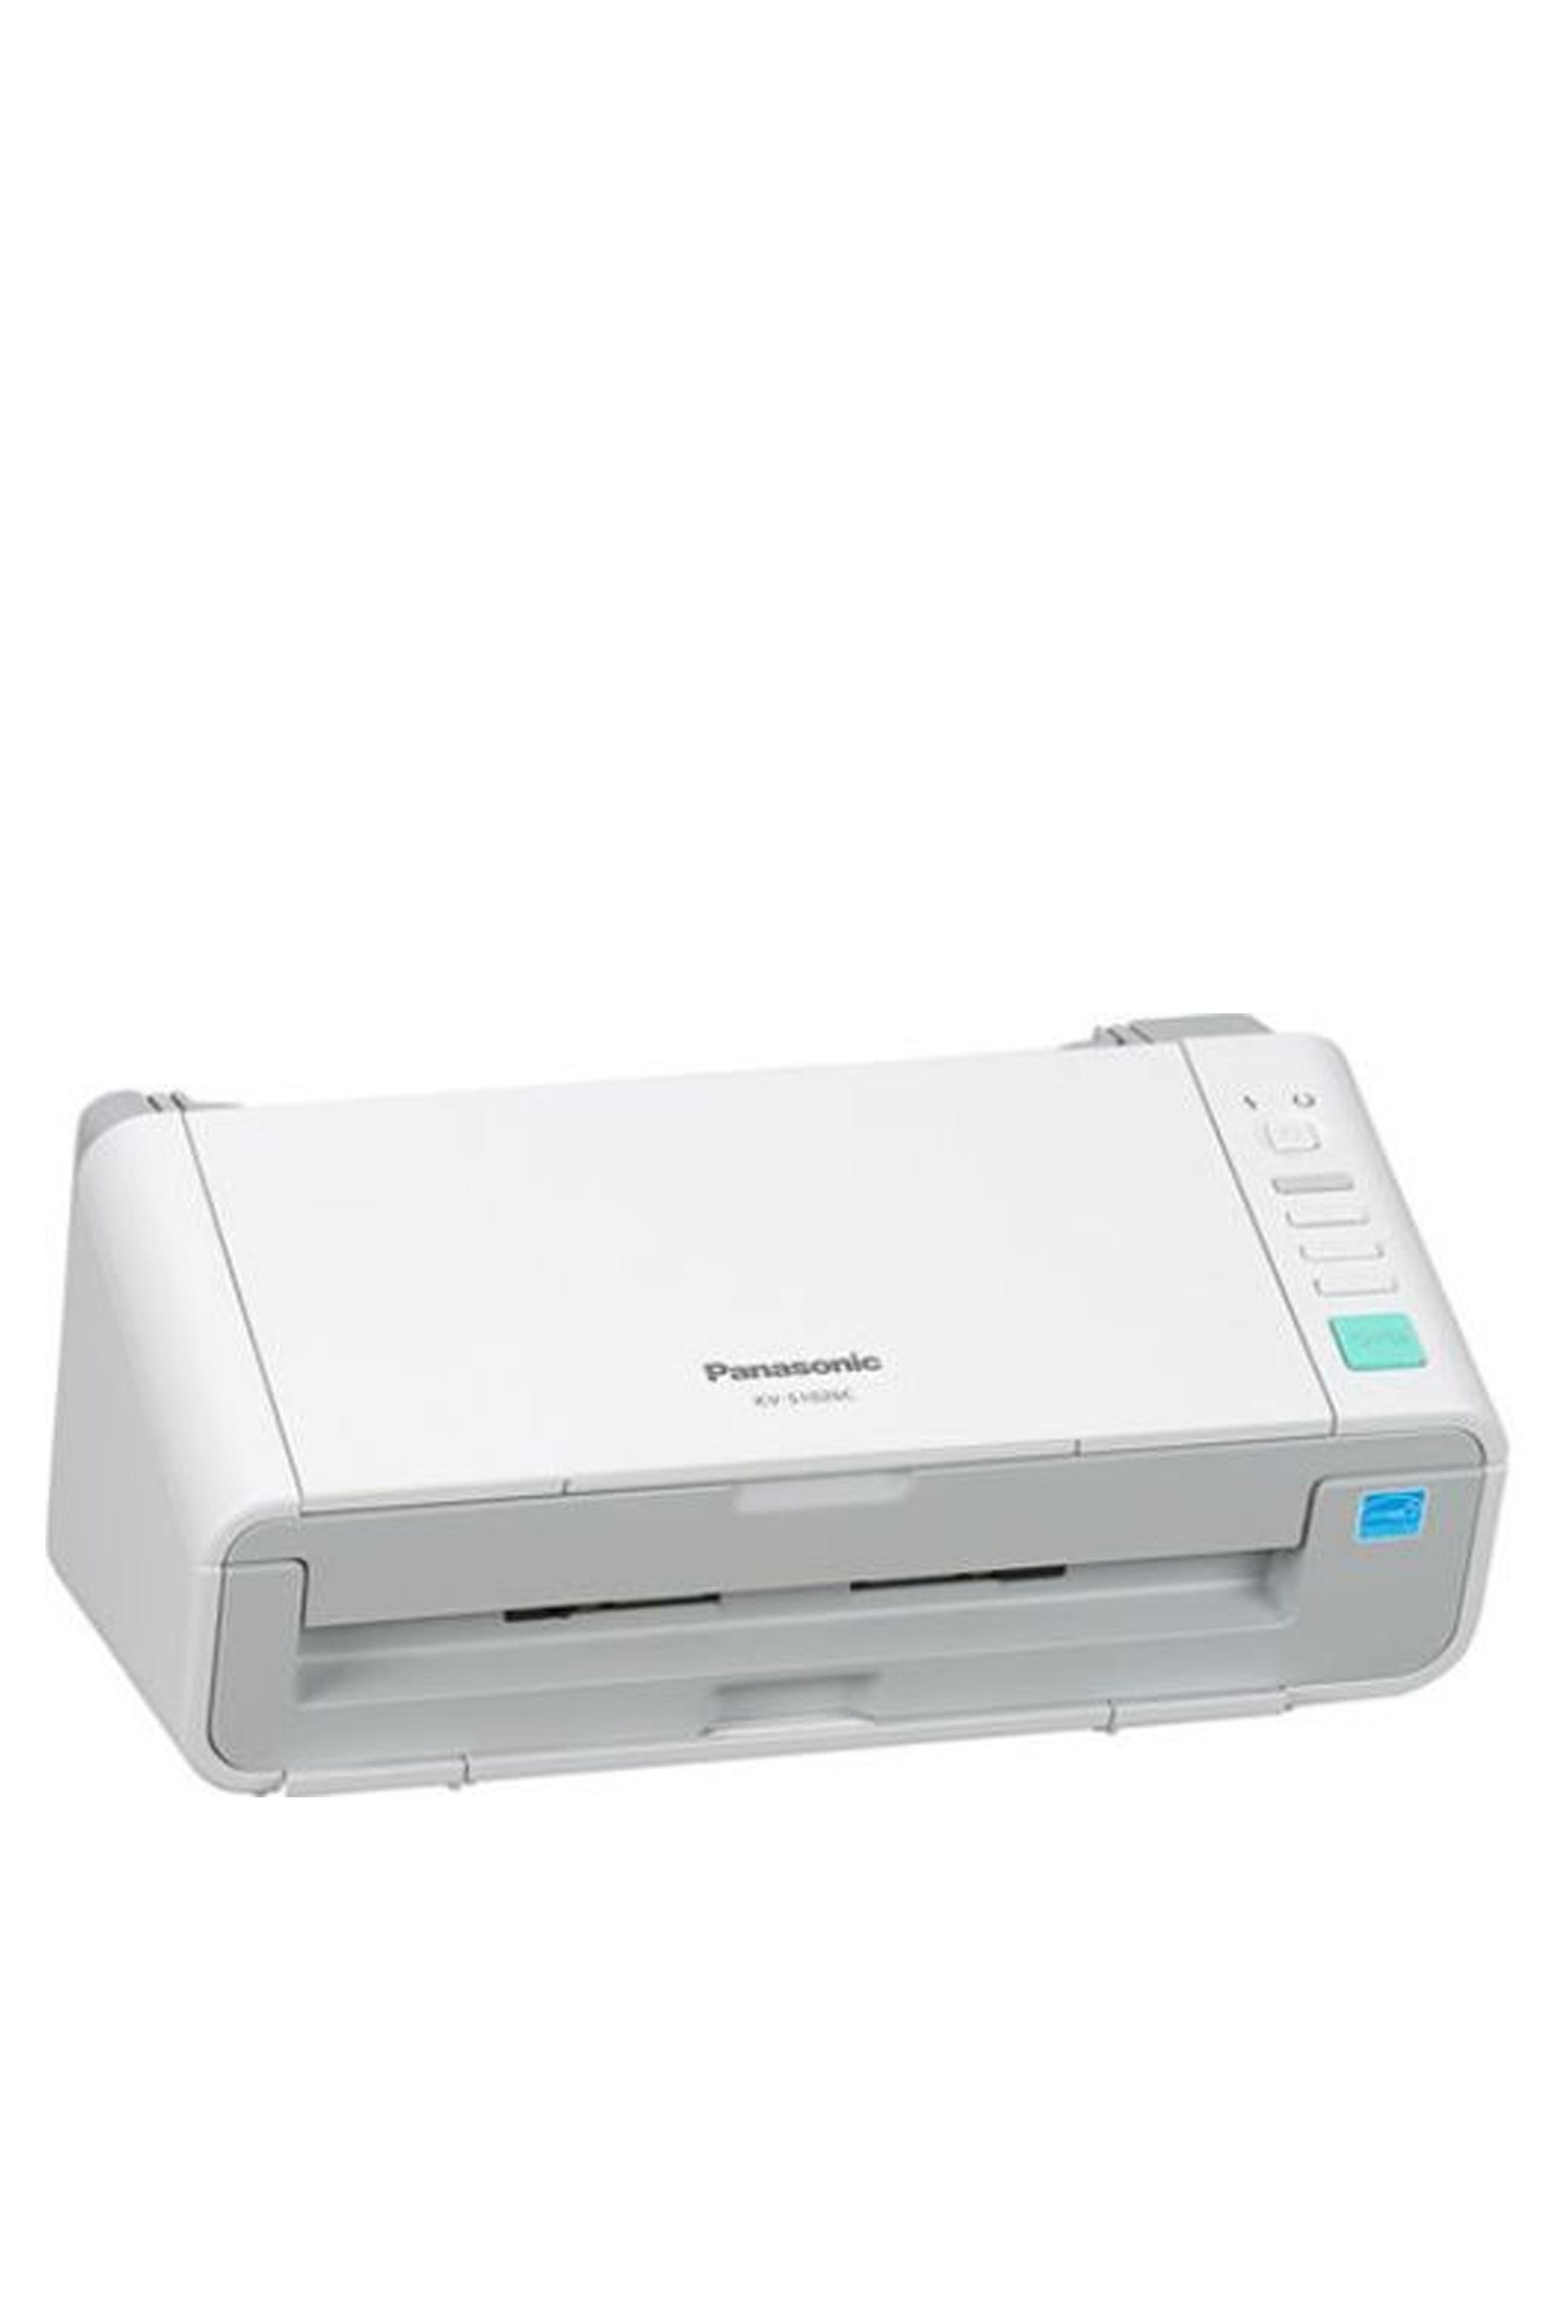 Panasonic KV-S1026CJ Color...